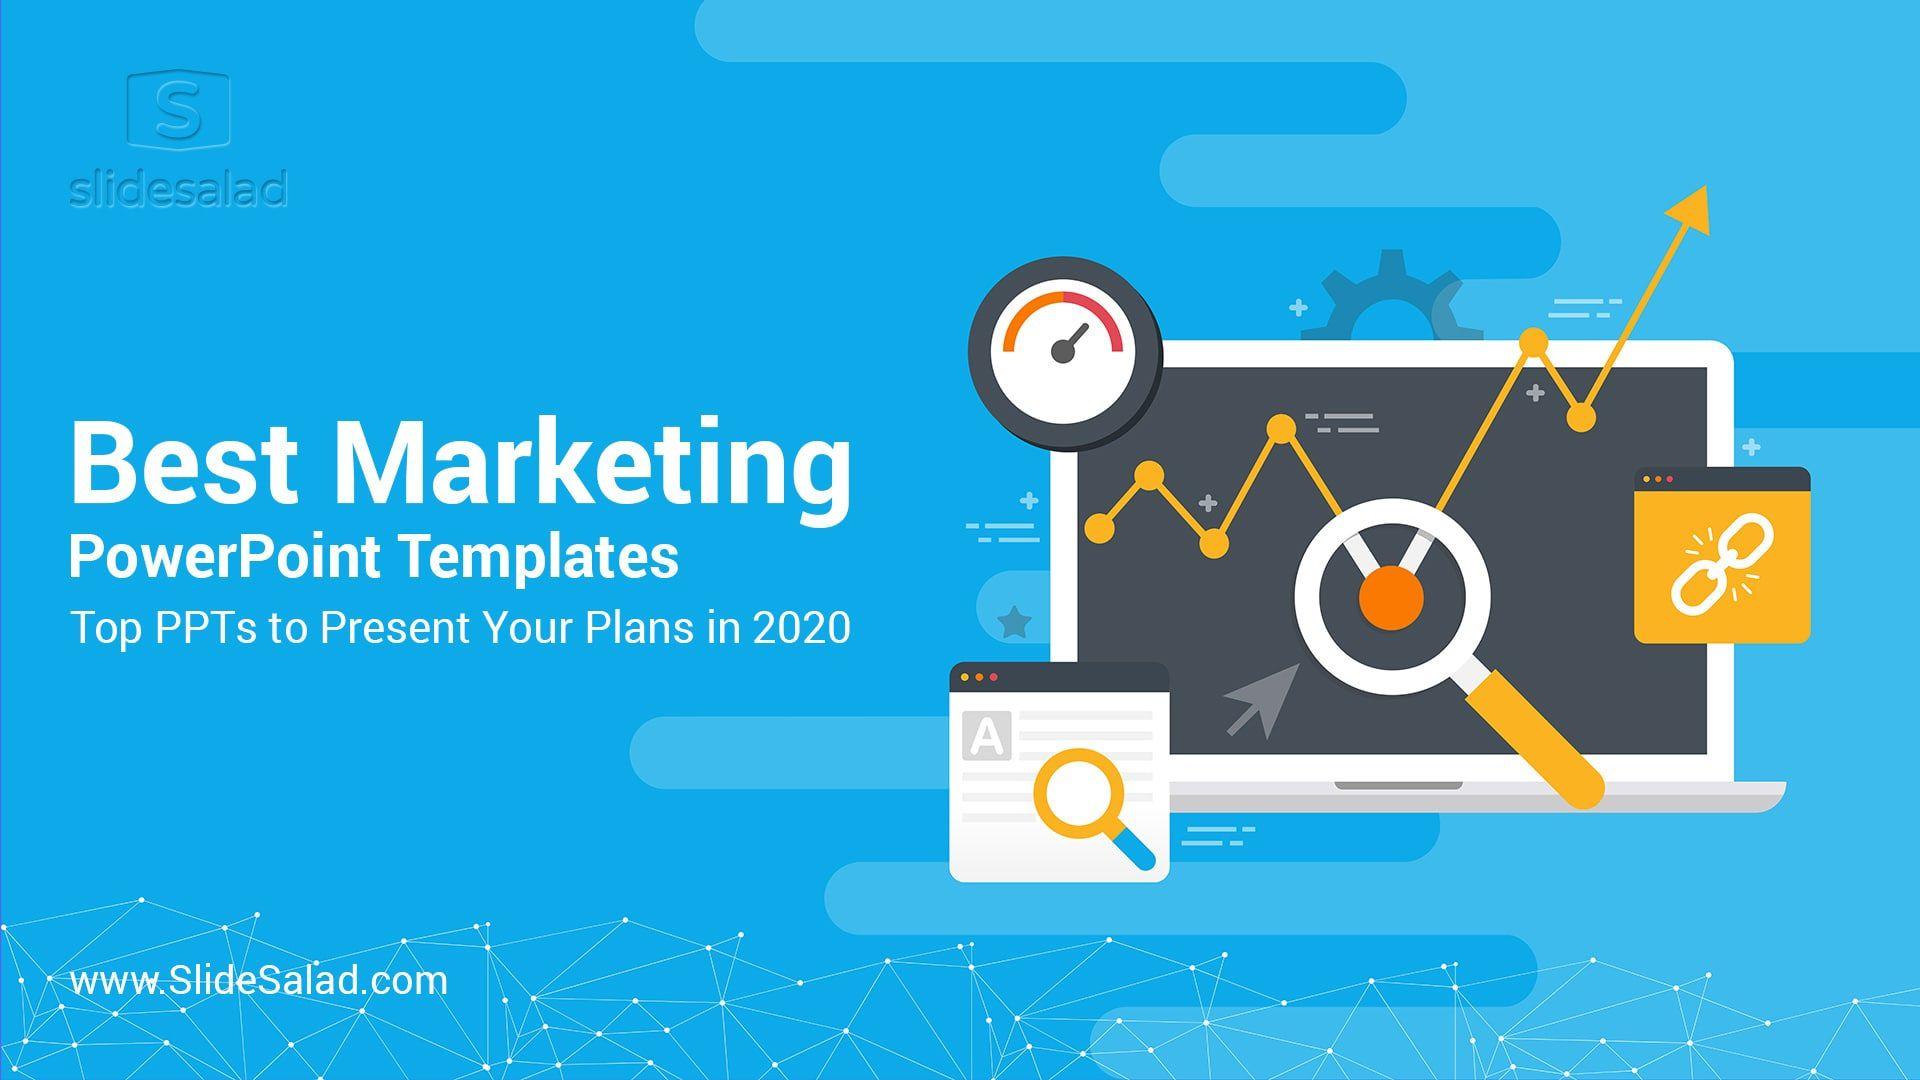 001 Incredible Digital Marketing Plan Template Ppt Picture  Presentation Free SlideshareFull